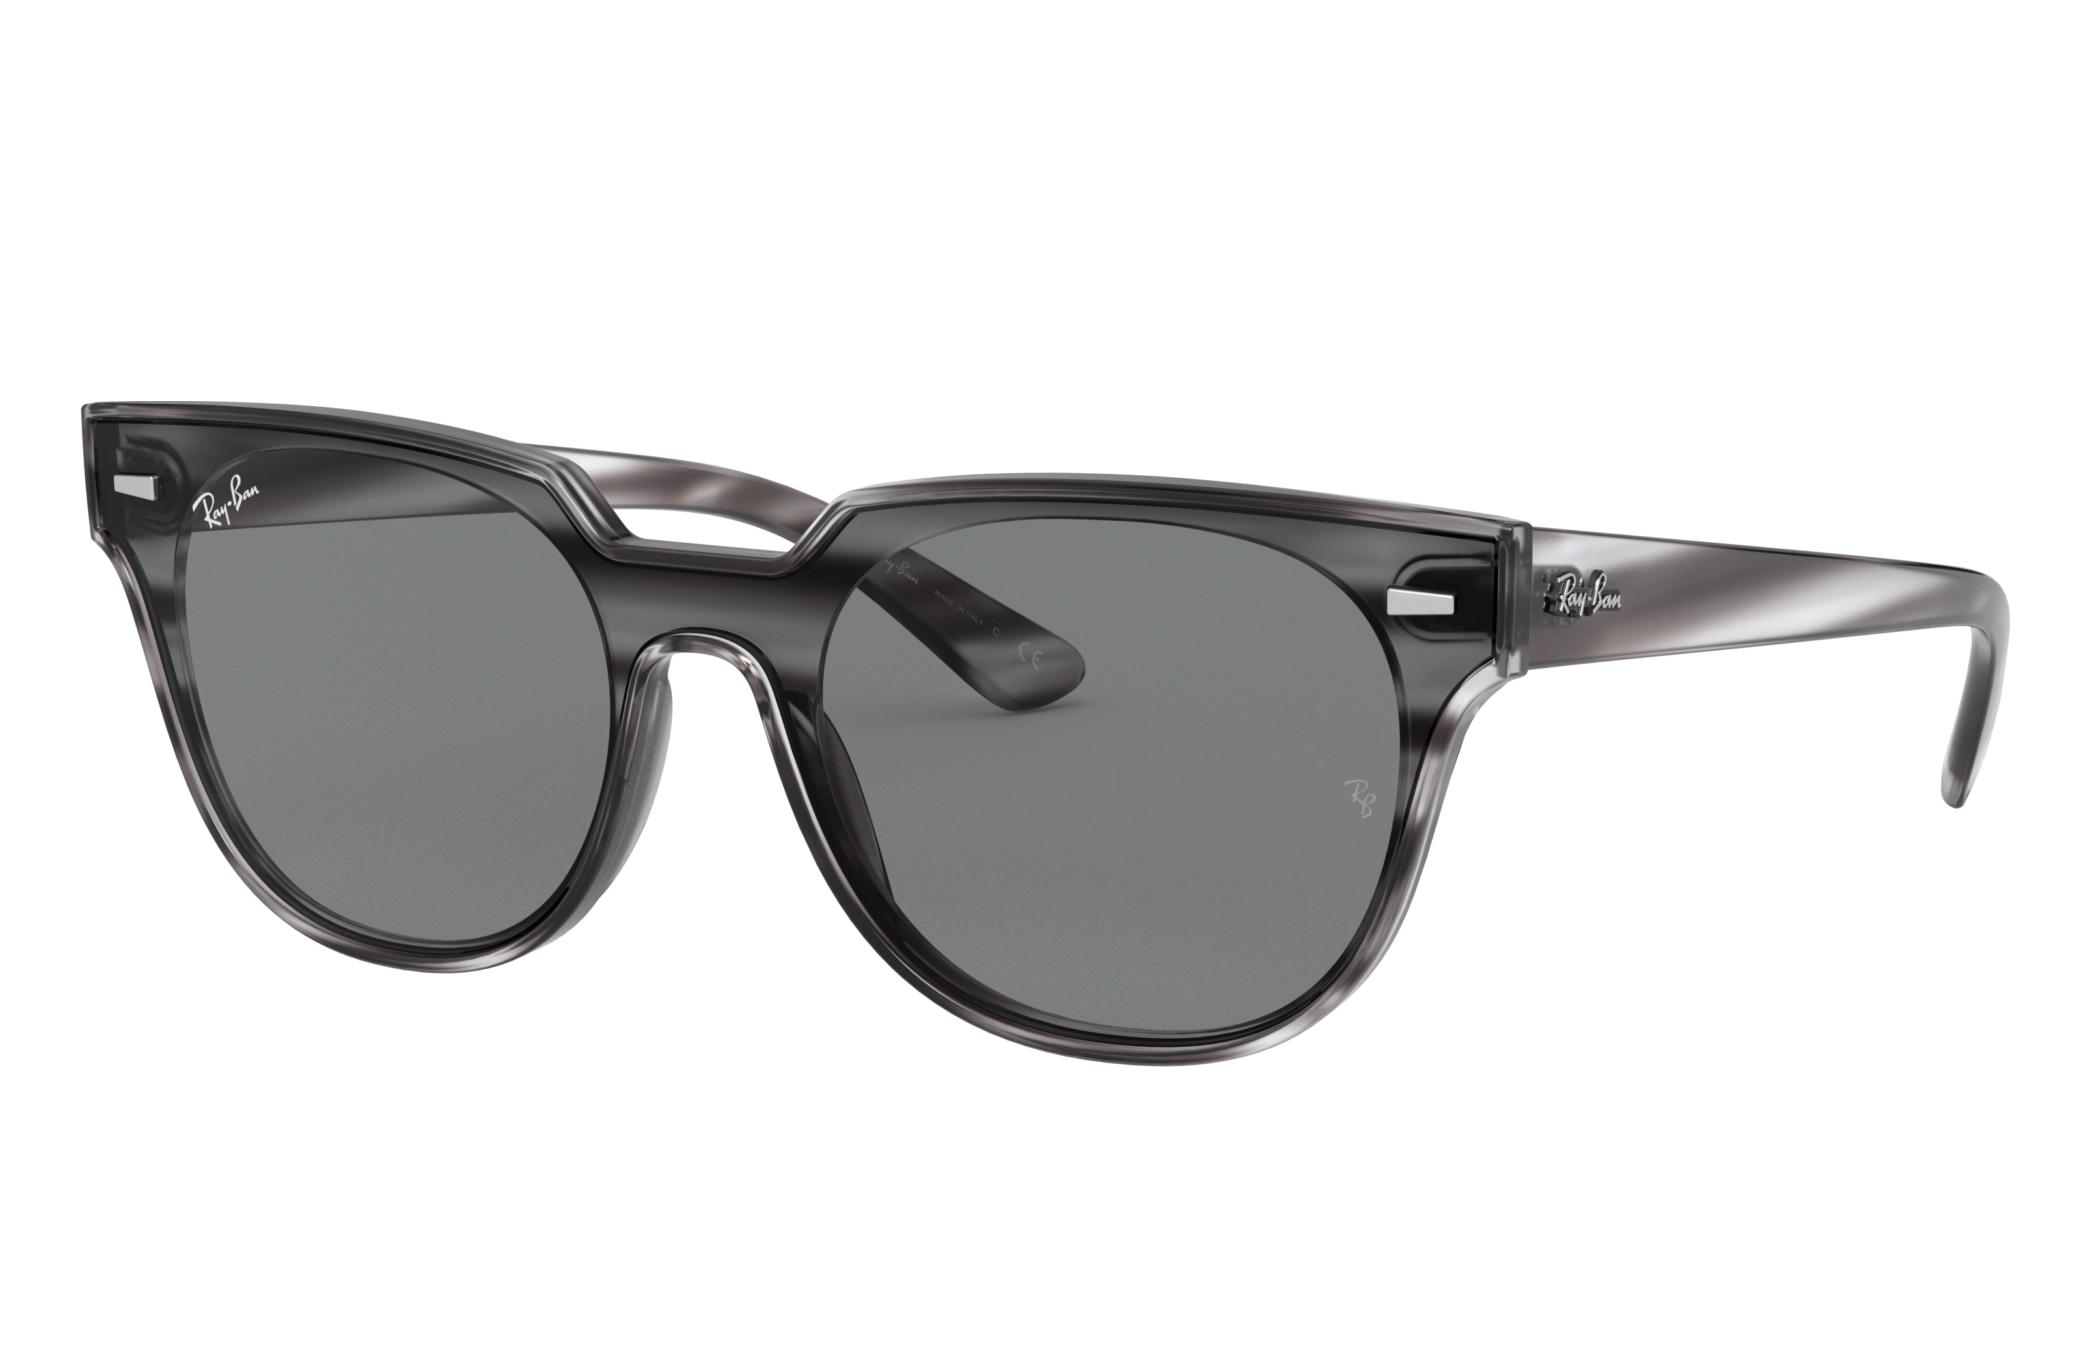 Ray-Ban Blaze Meteor Striped Grey Havana, Gray Lenses - RB4368N